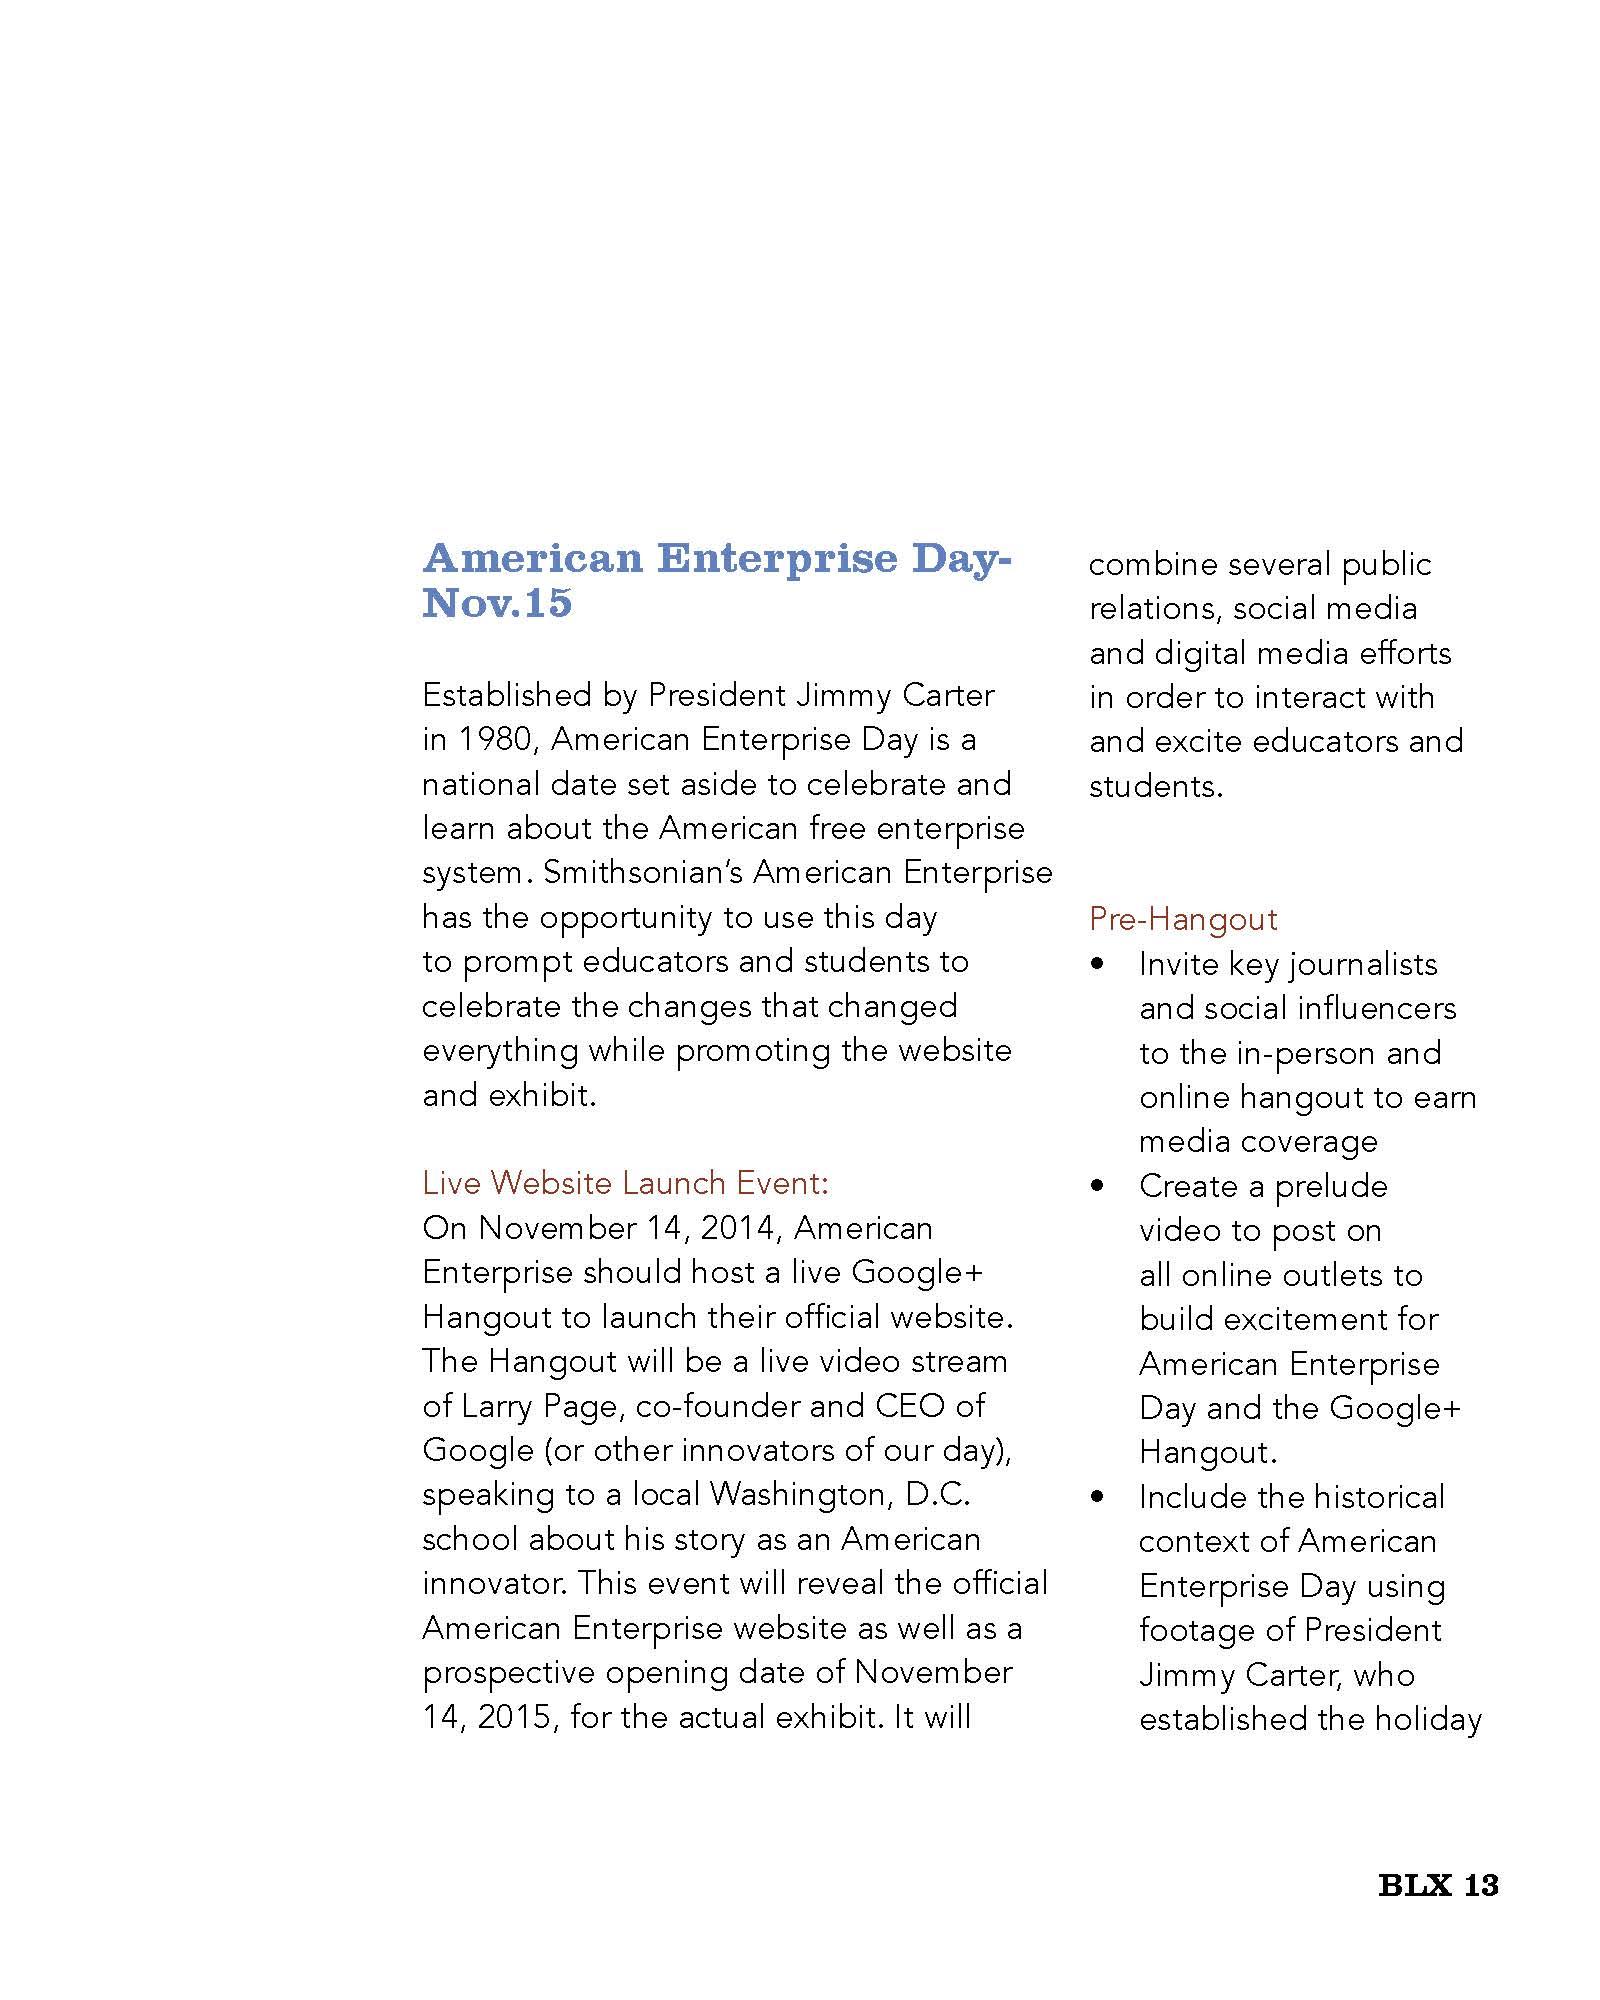 American Enterprise Plans Book%2C 2013%28cut%29_Page_47.jpg